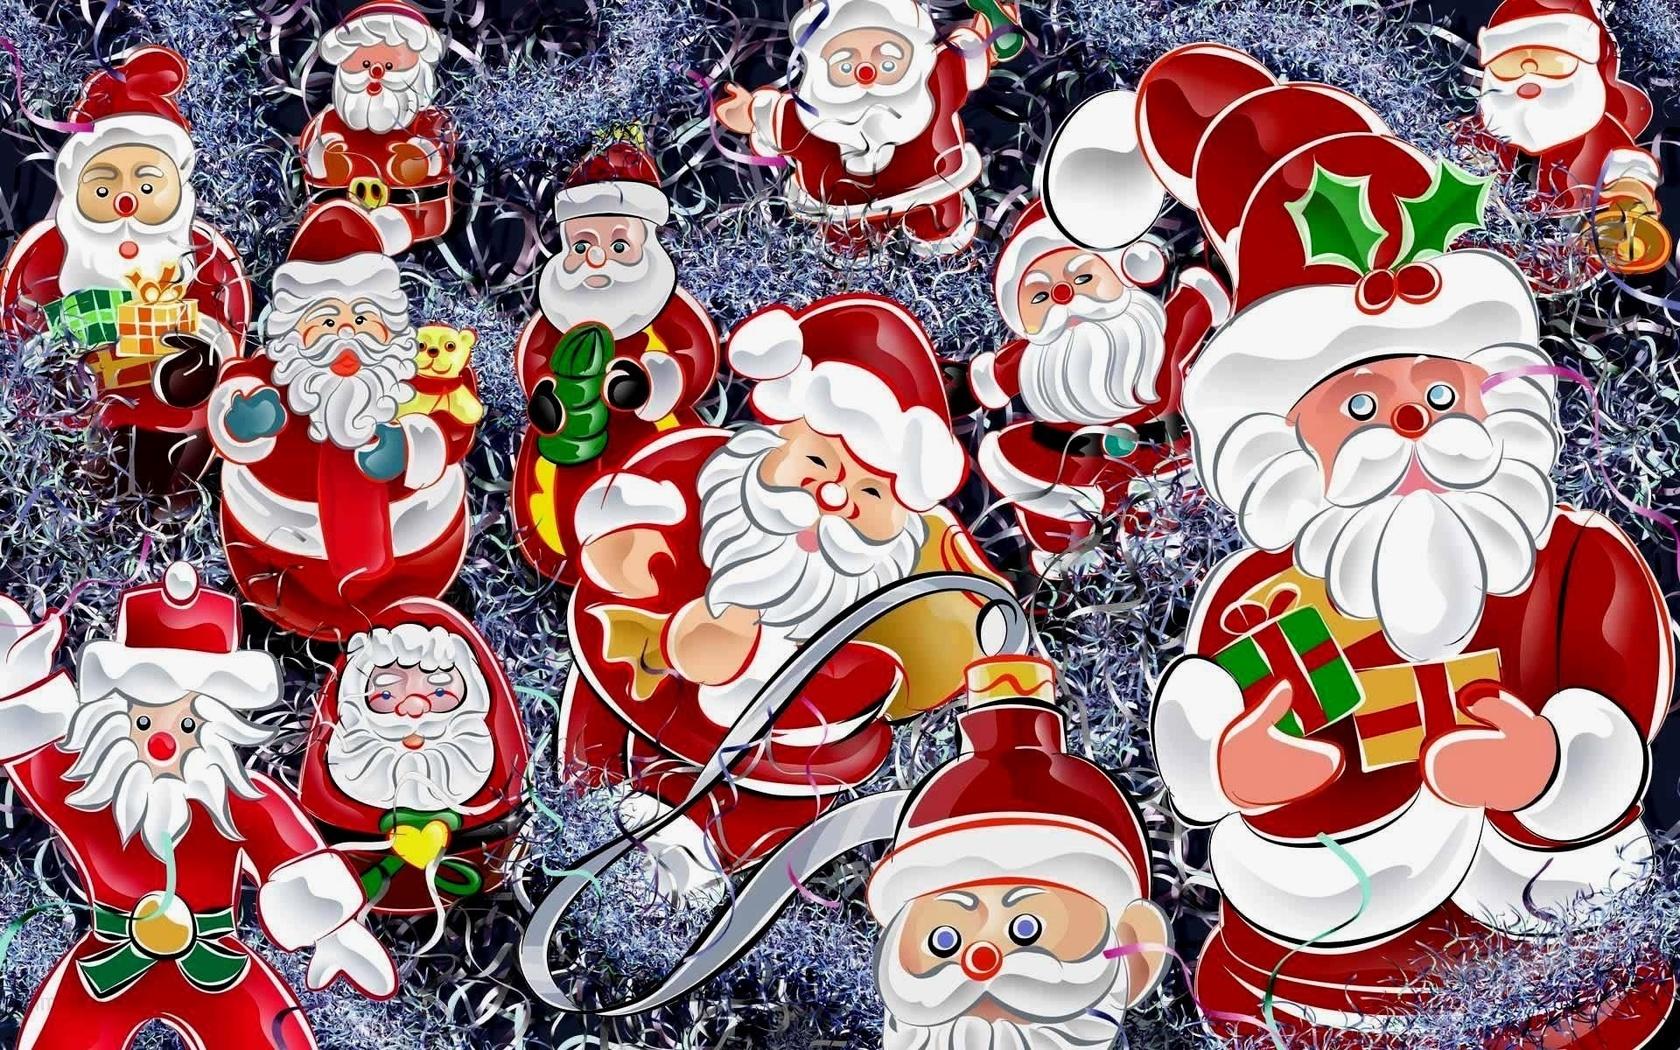 Фон картинки новый год дед мороз